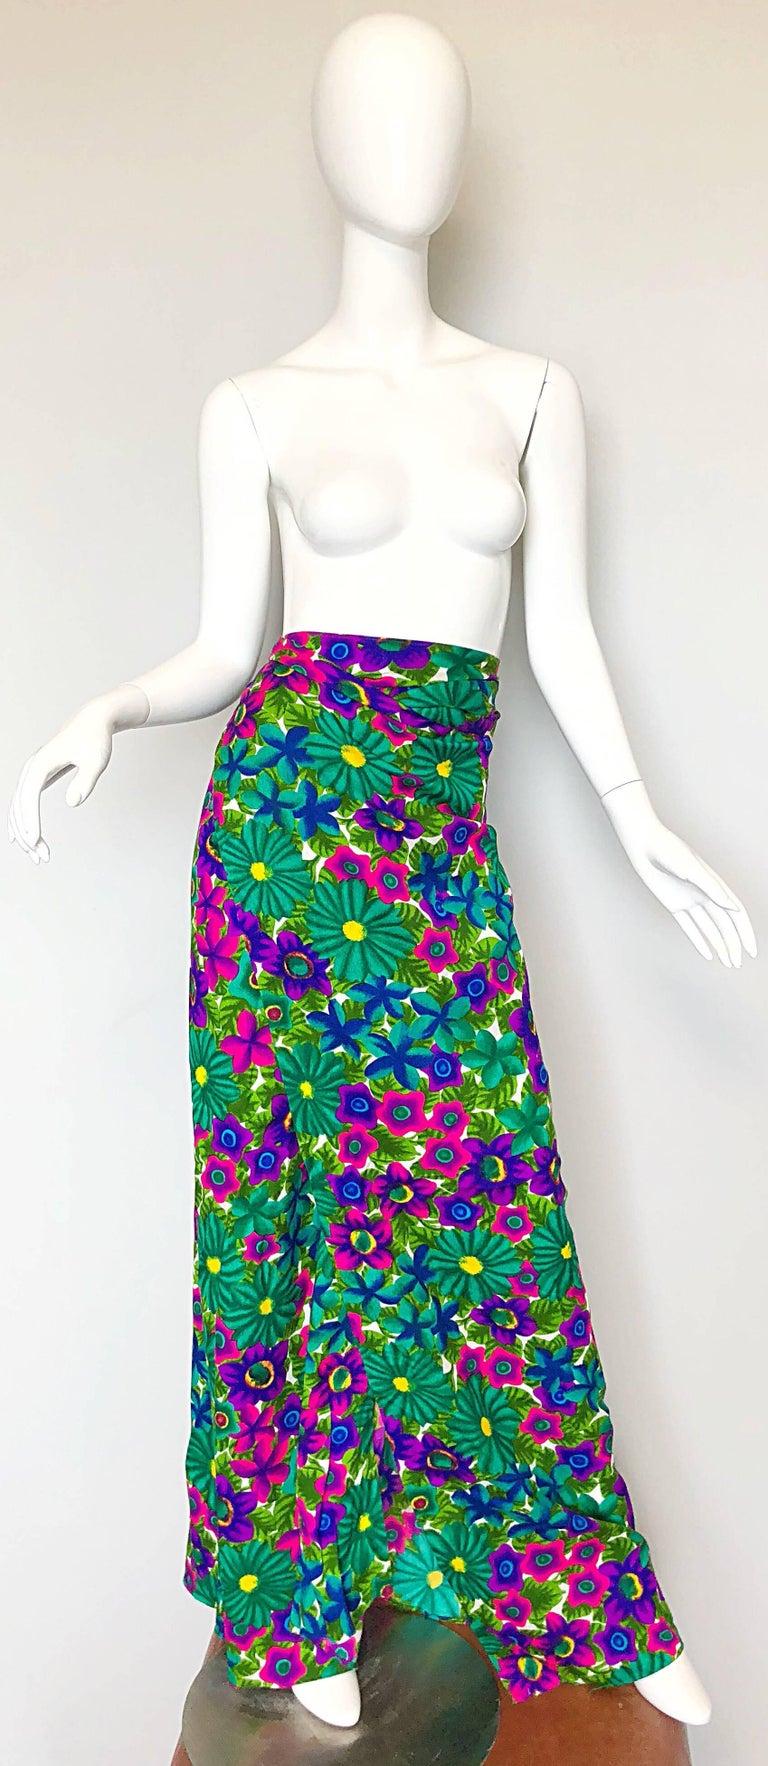 1970s Pomare Hawaiian Vintage Colorful Tropical Print Halter Wrap 70s Maxi Dress For Sale 1